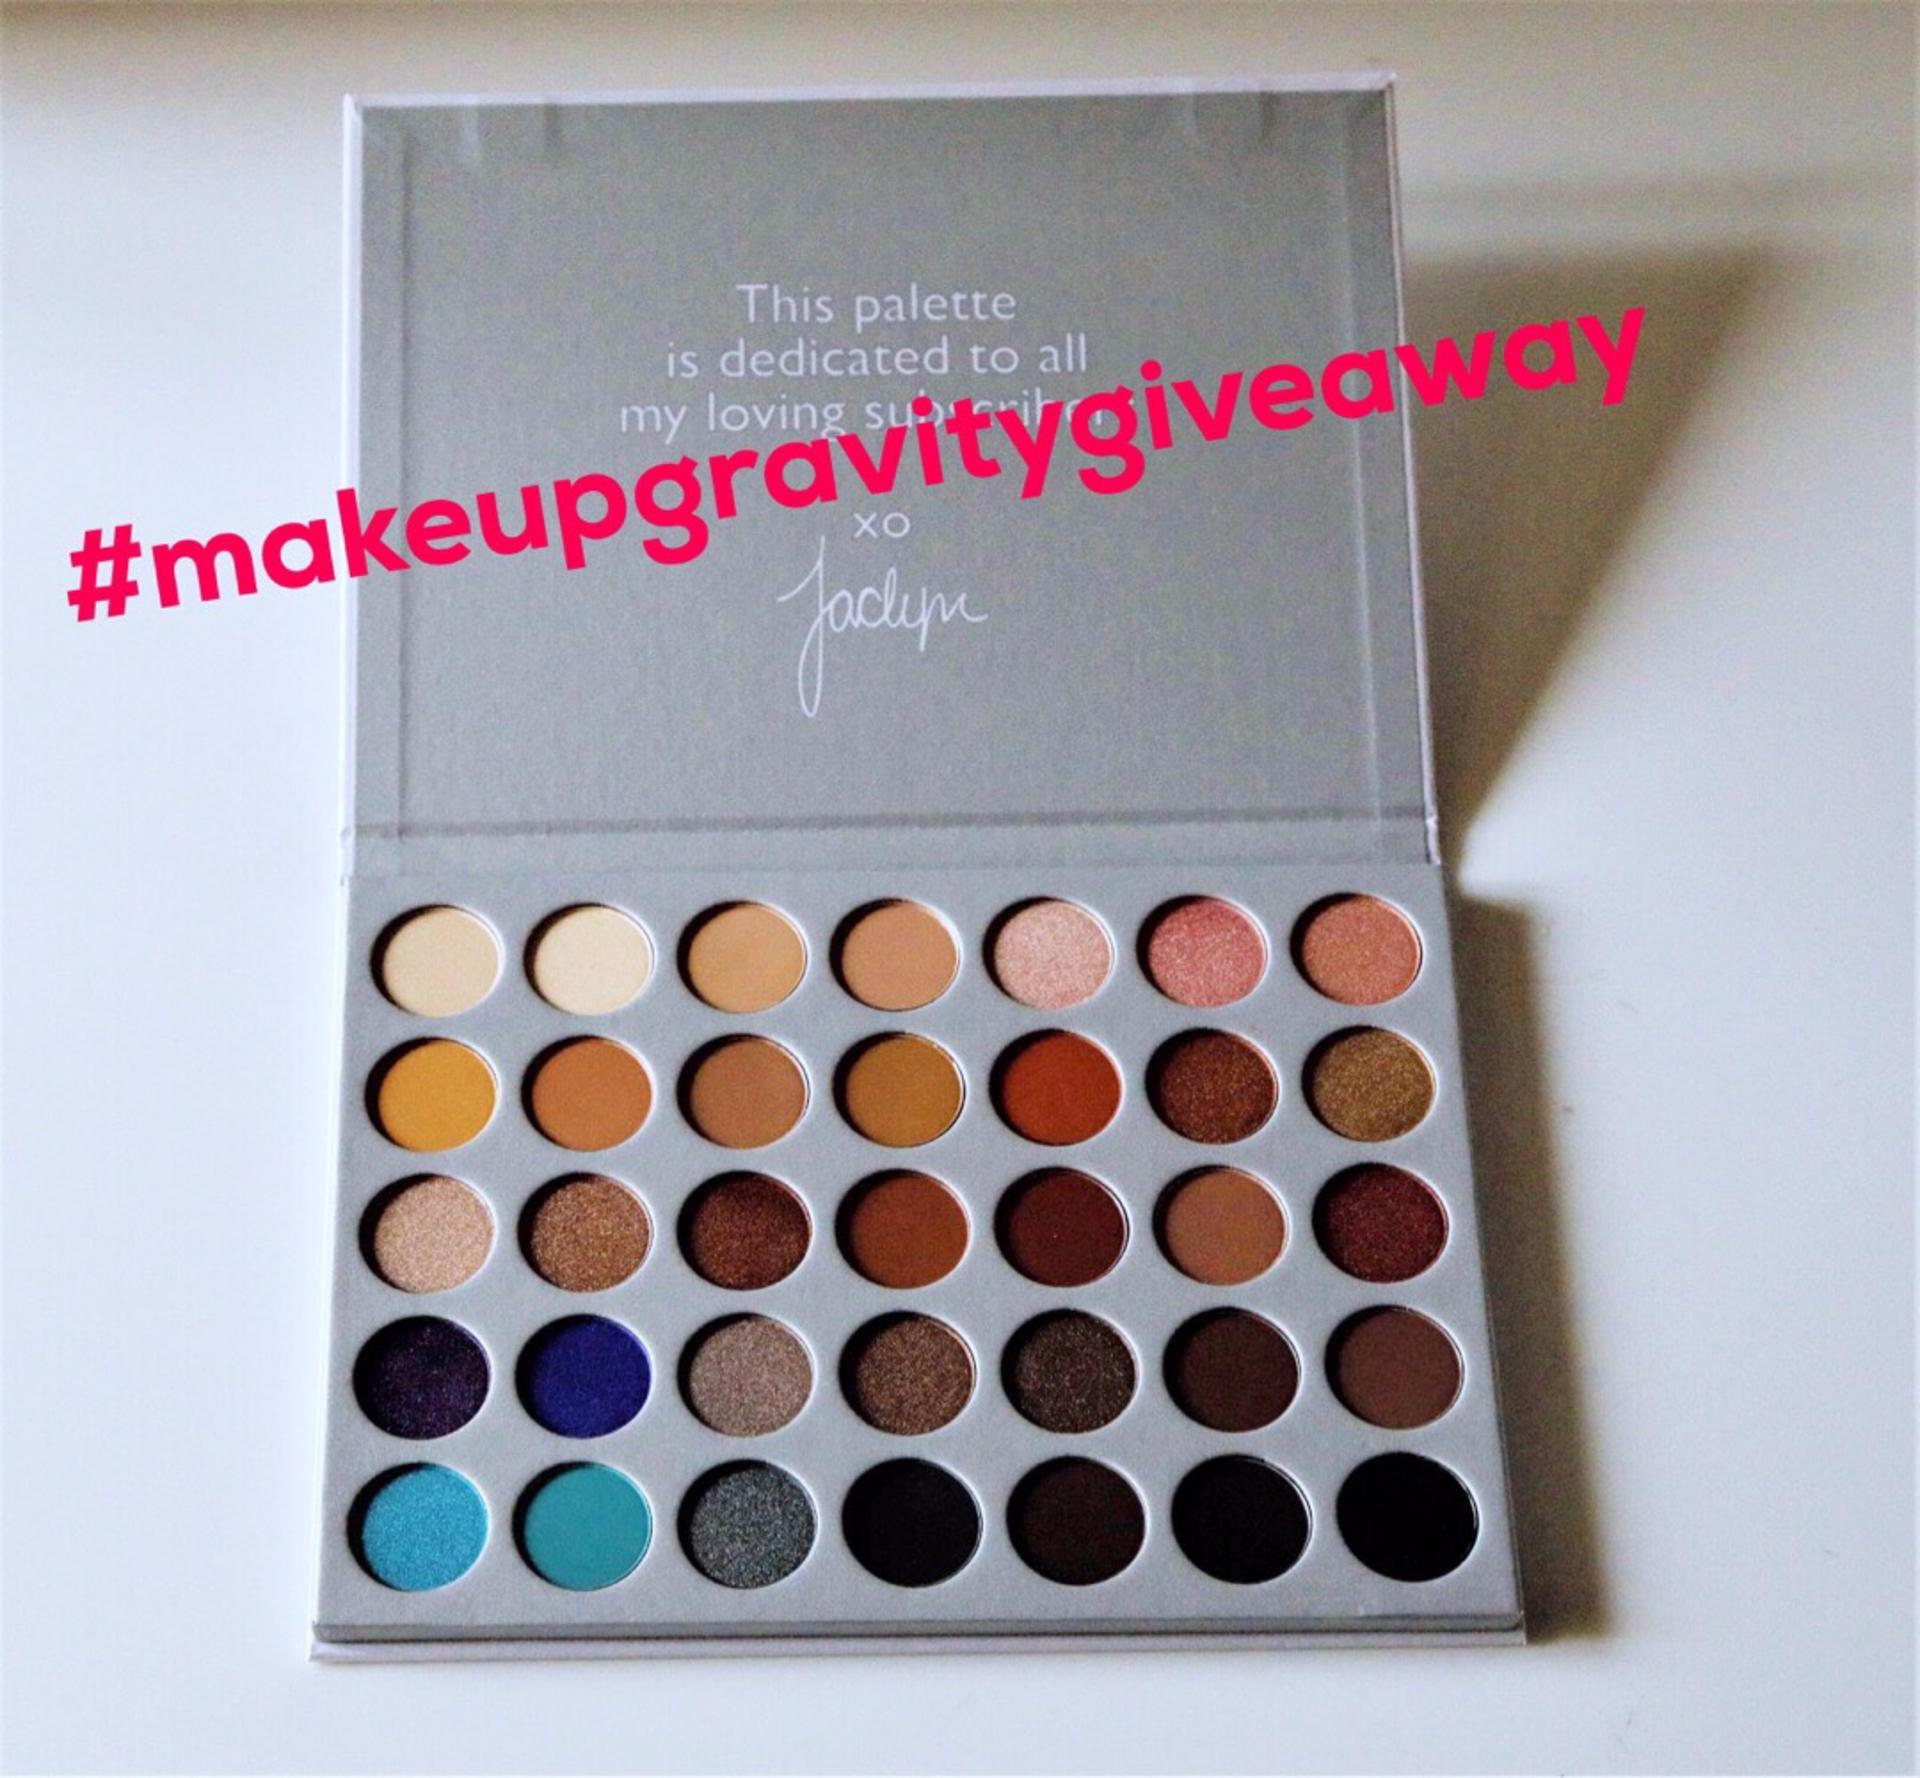 Makeup Give away image